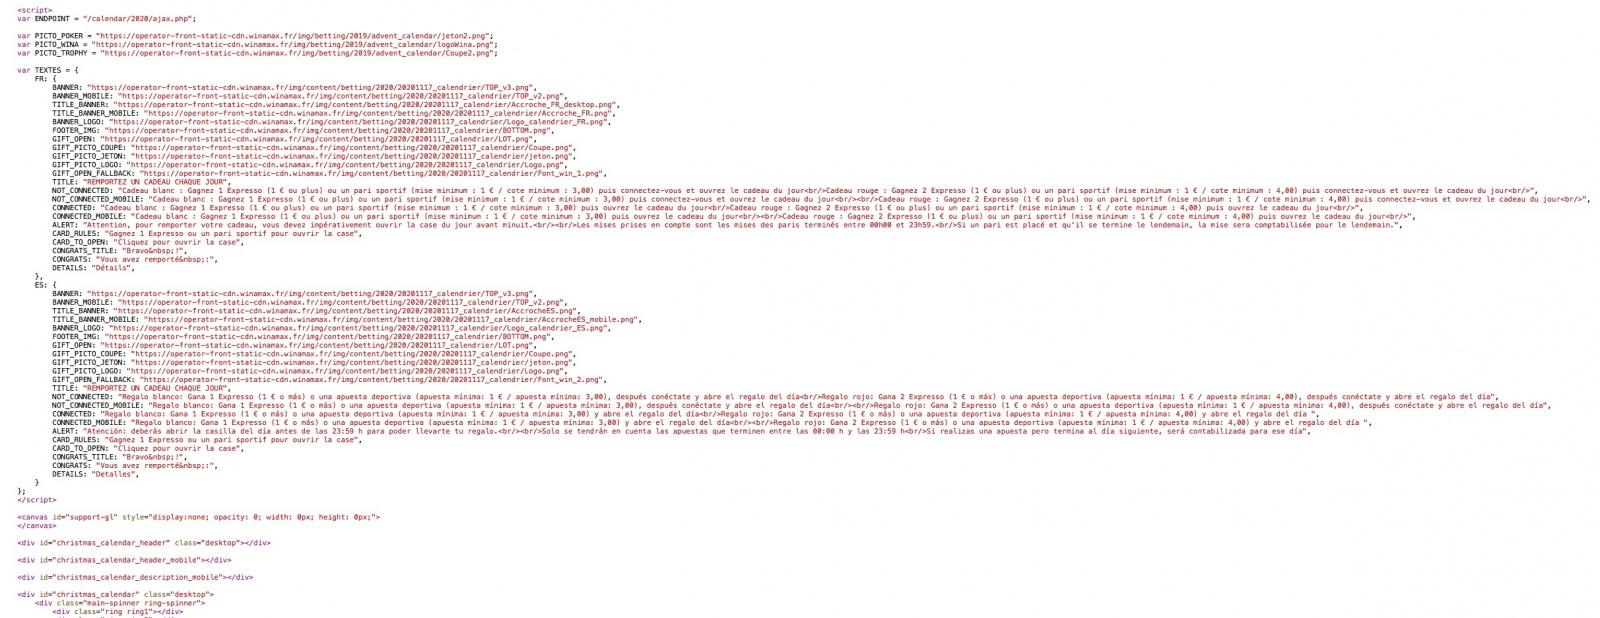 Calendrier_Avent_Winamax_2020.thumb.jpeg.c6b06d47f167e4cba275d6ef5d96b663.jpeg